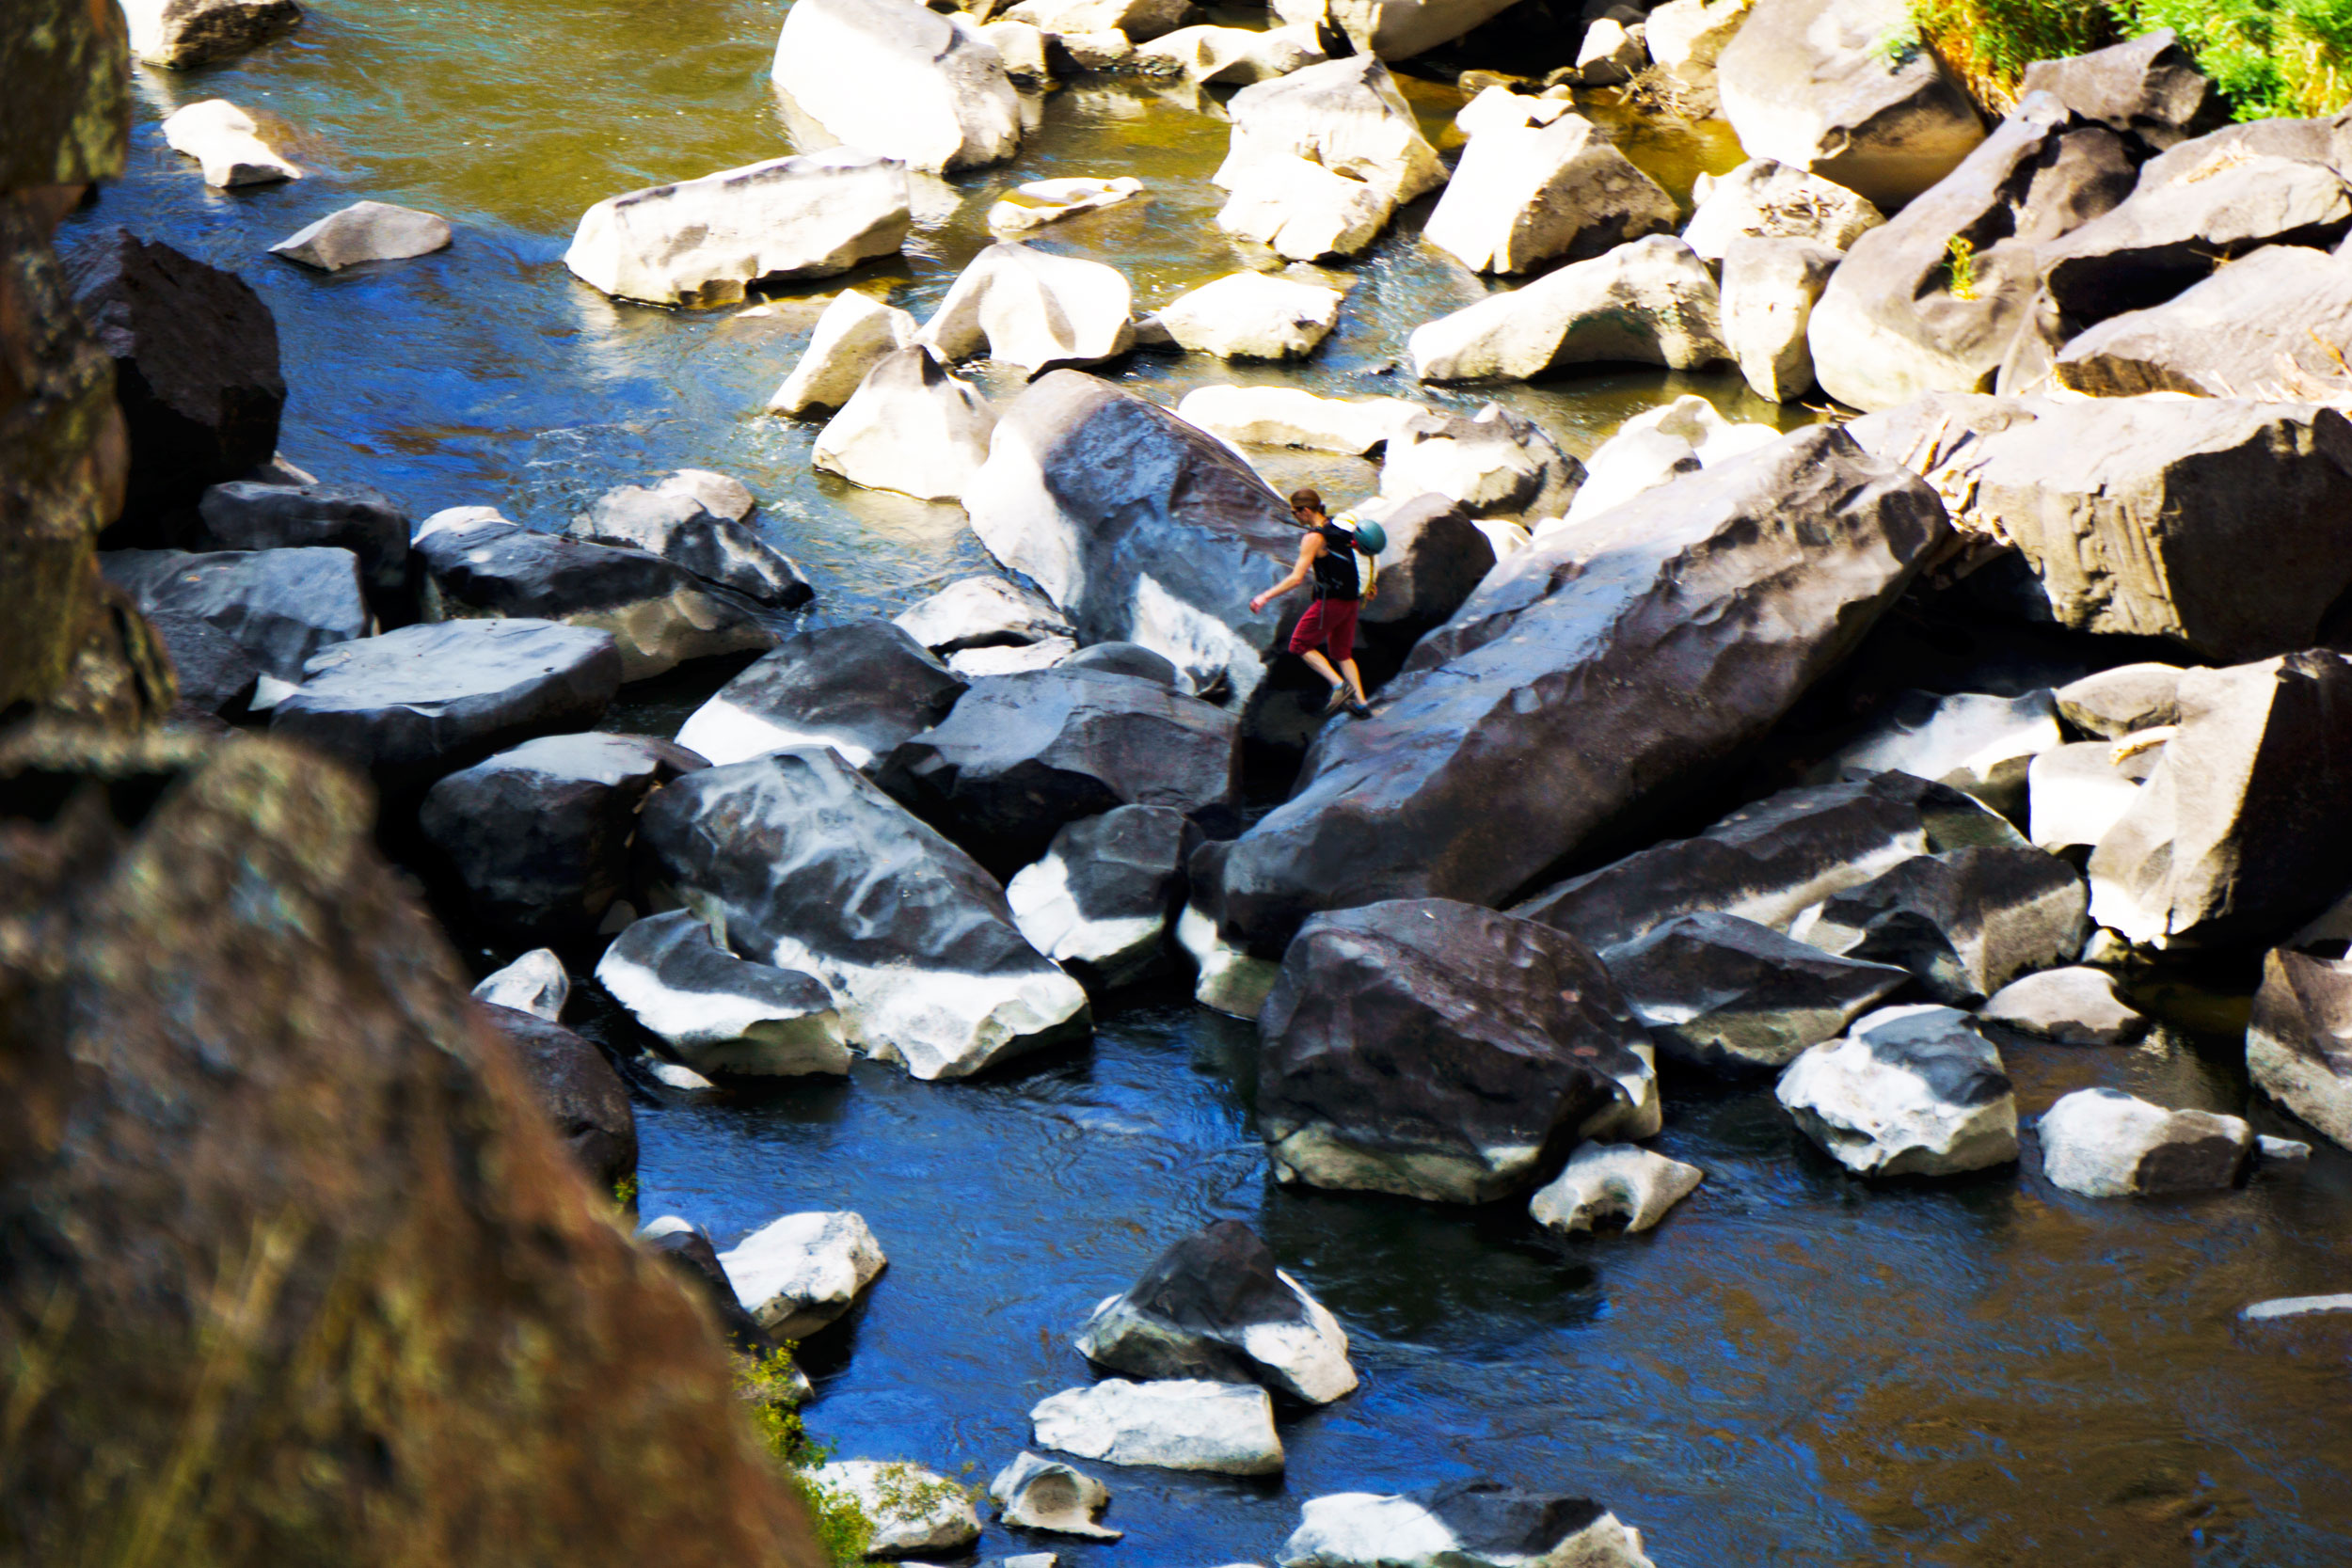 climberscrookedriverbouldercrossinglowergorge